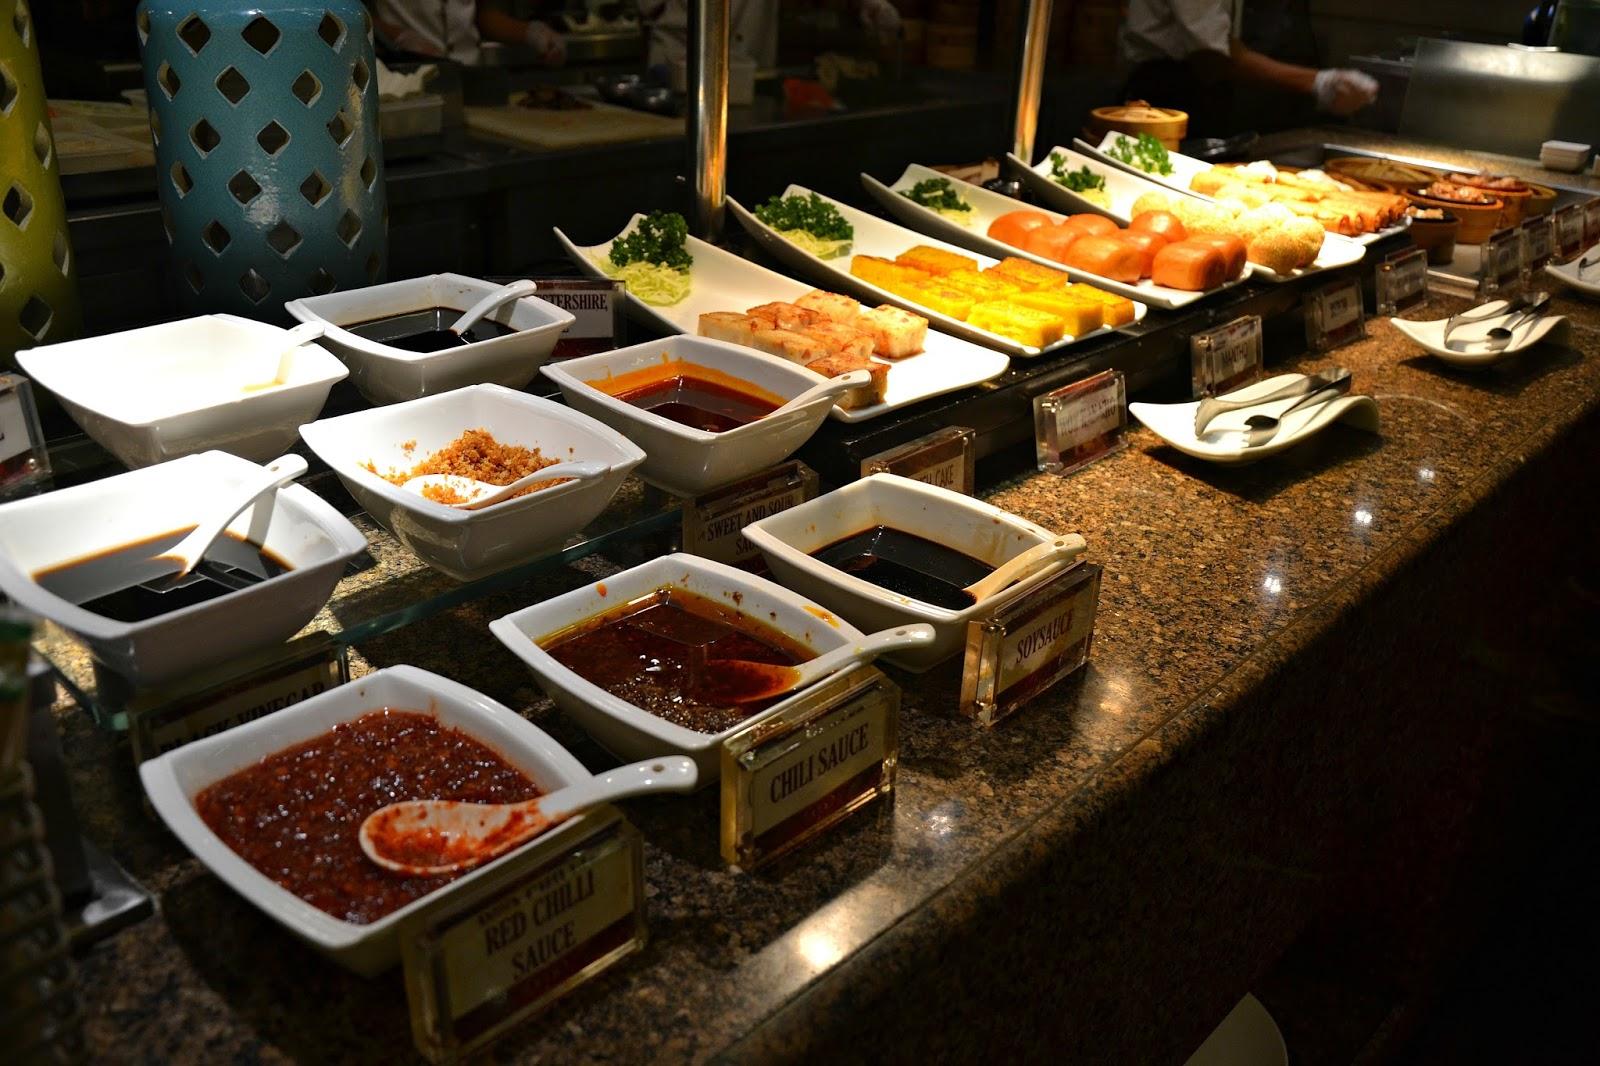 Remarkable Foodtrip Buffet 101 International Cuisine Moa Home Interior And Landscaping Oversignezvosmurscom